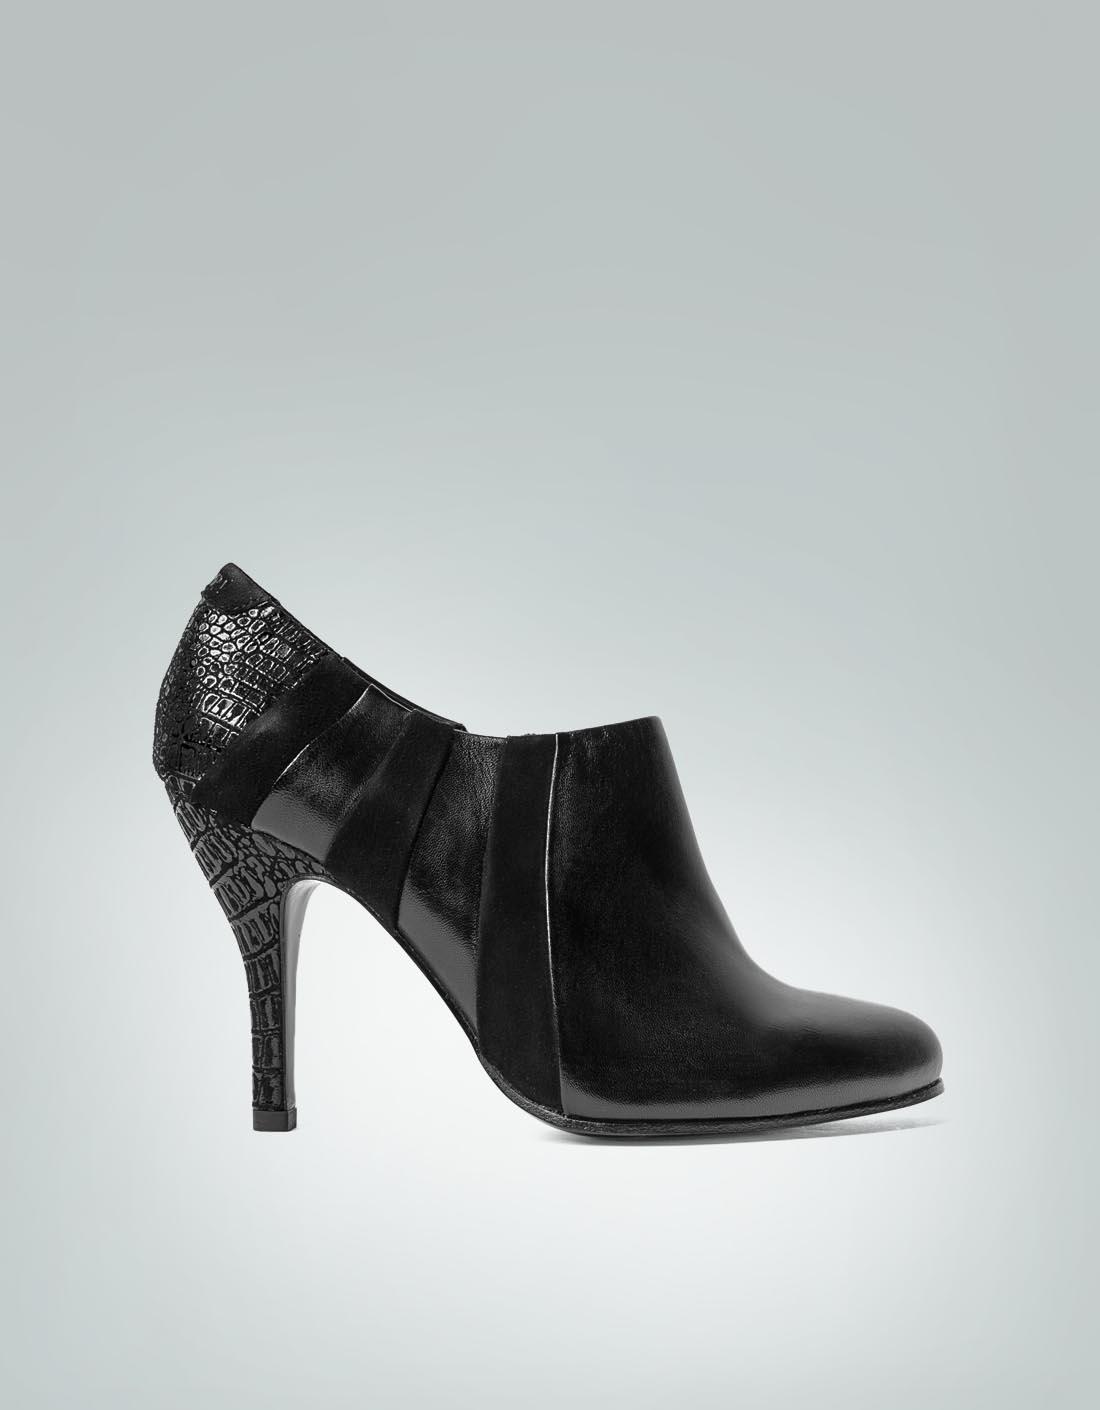 JOOP Damen Schuhe Pumps mit Krokoprägung schwarz bGiAkGhFsm